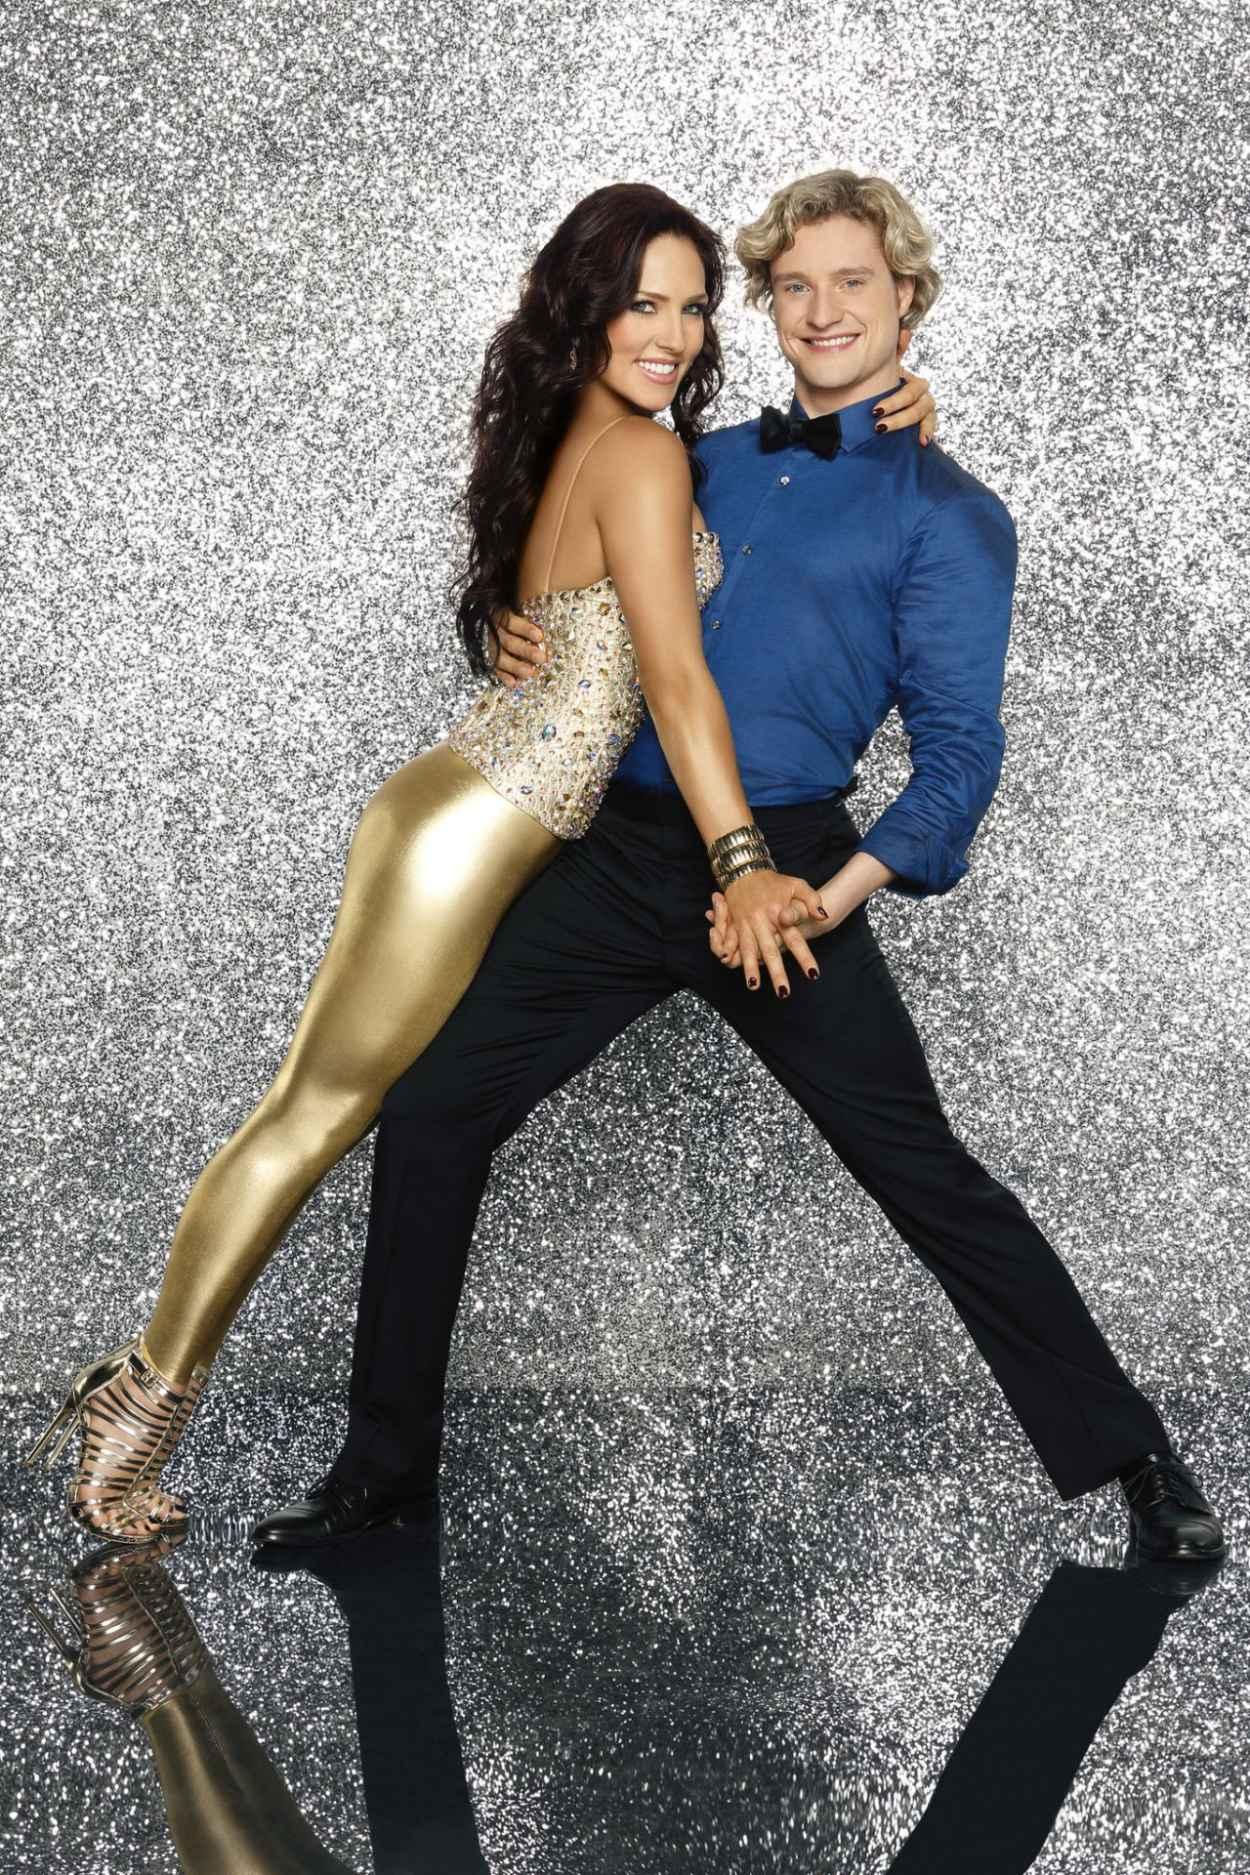 Sharna Burgess - Dancing with the Stars - Season 18 - Promo Photo-1